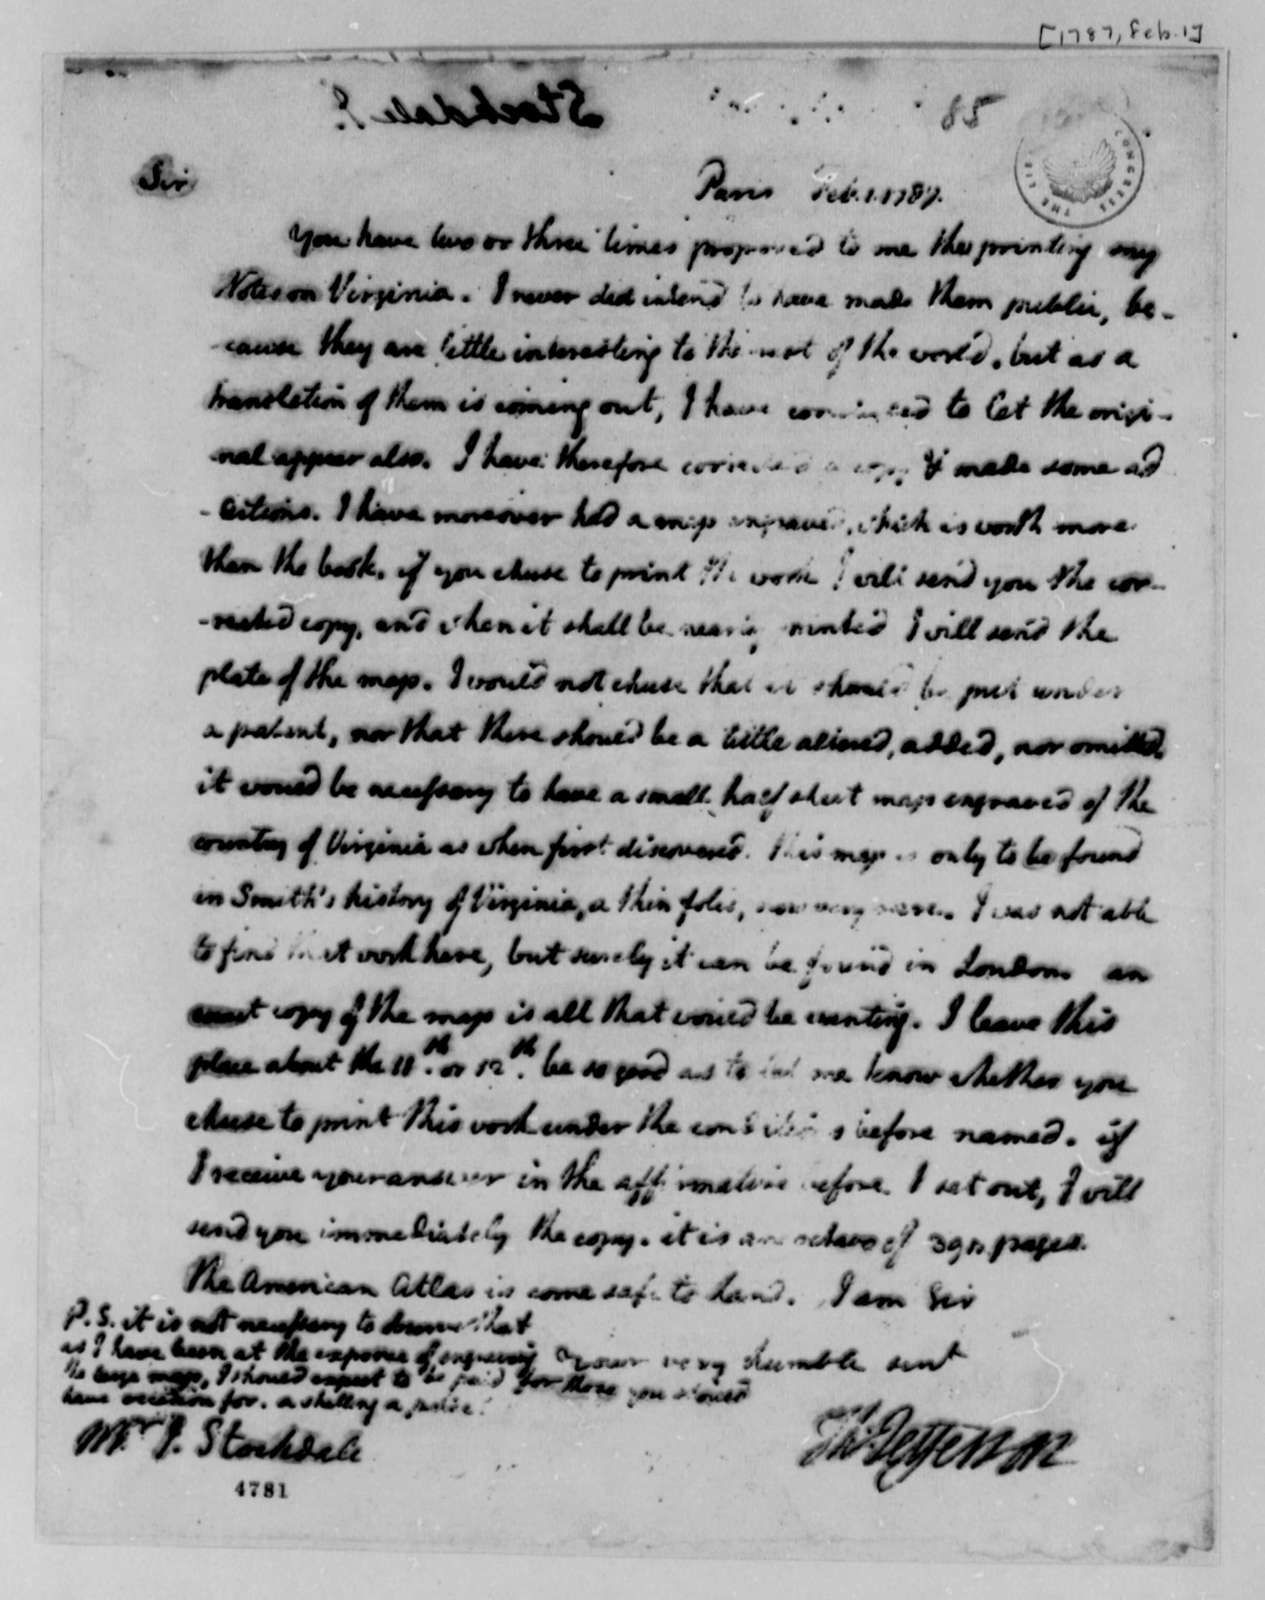 Thomas Jefferson to John Stockdale, February 1, 1787